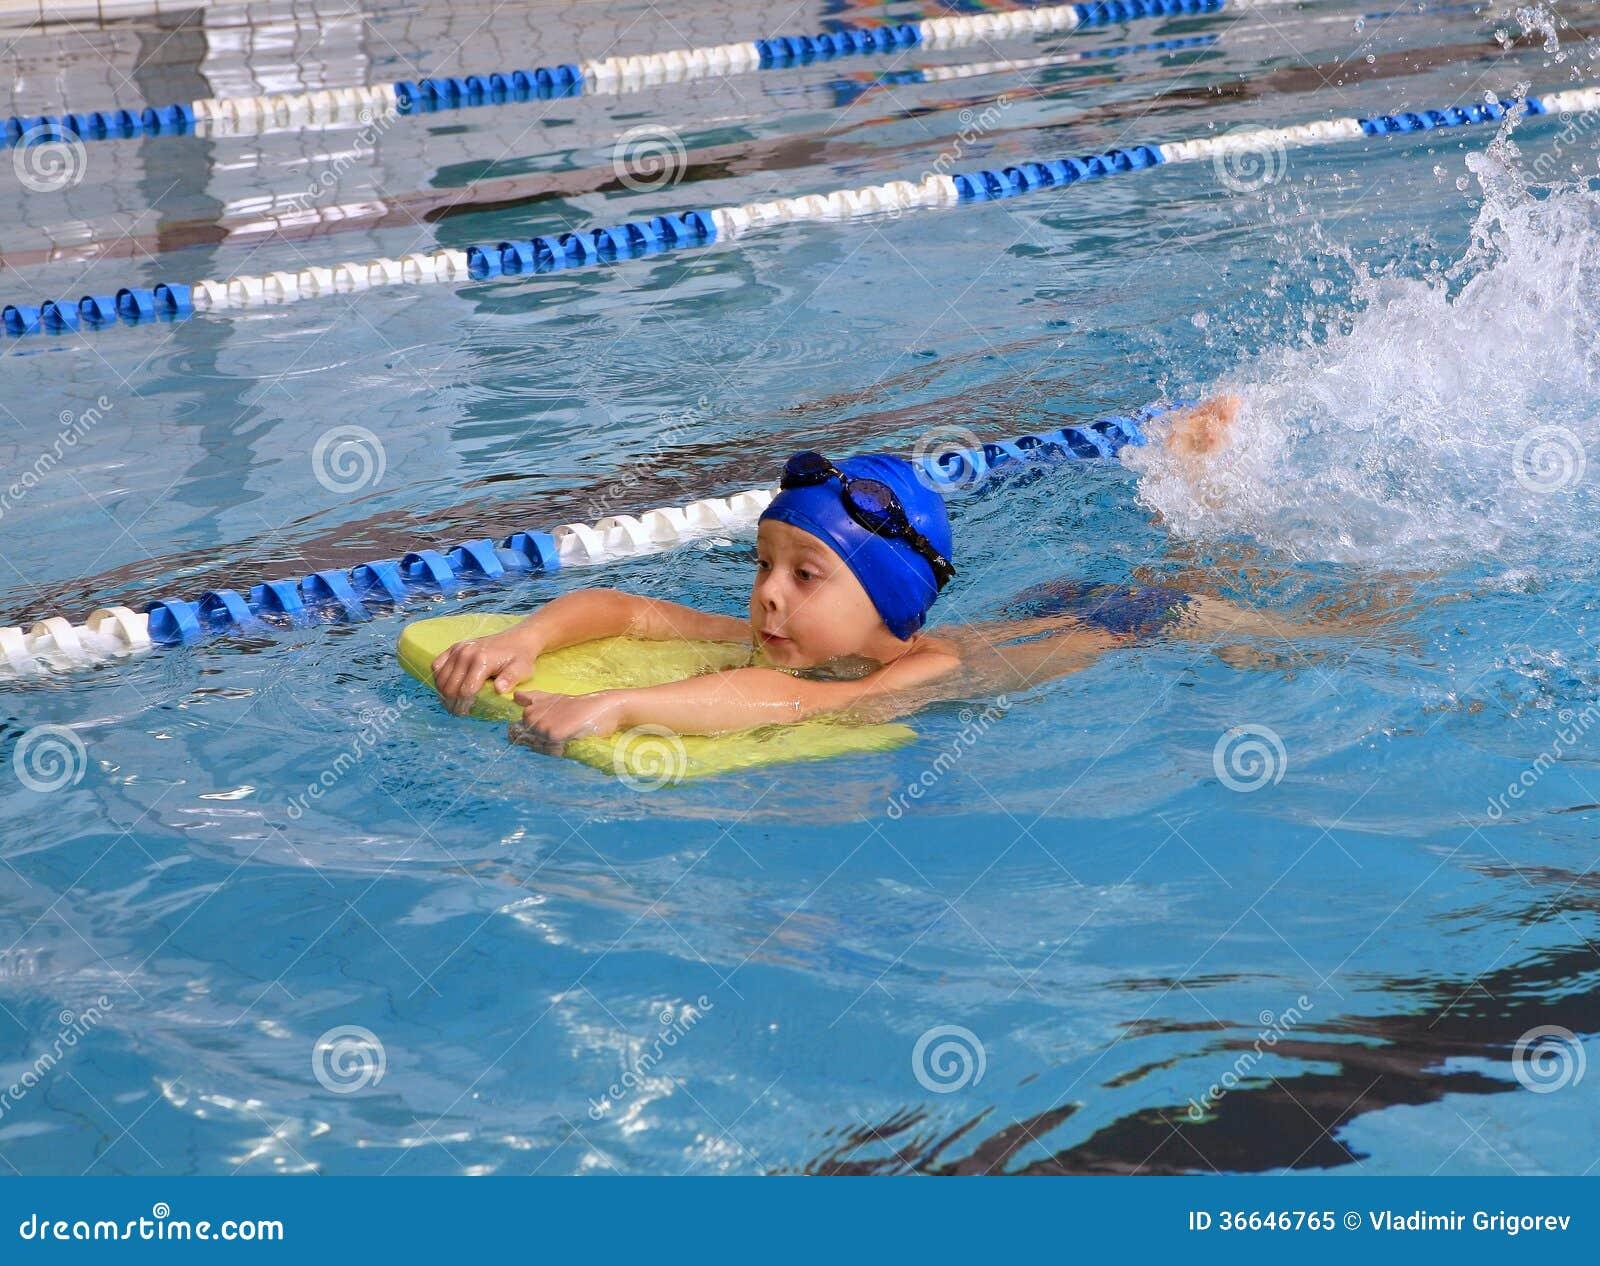 Russian Boy Swim Images